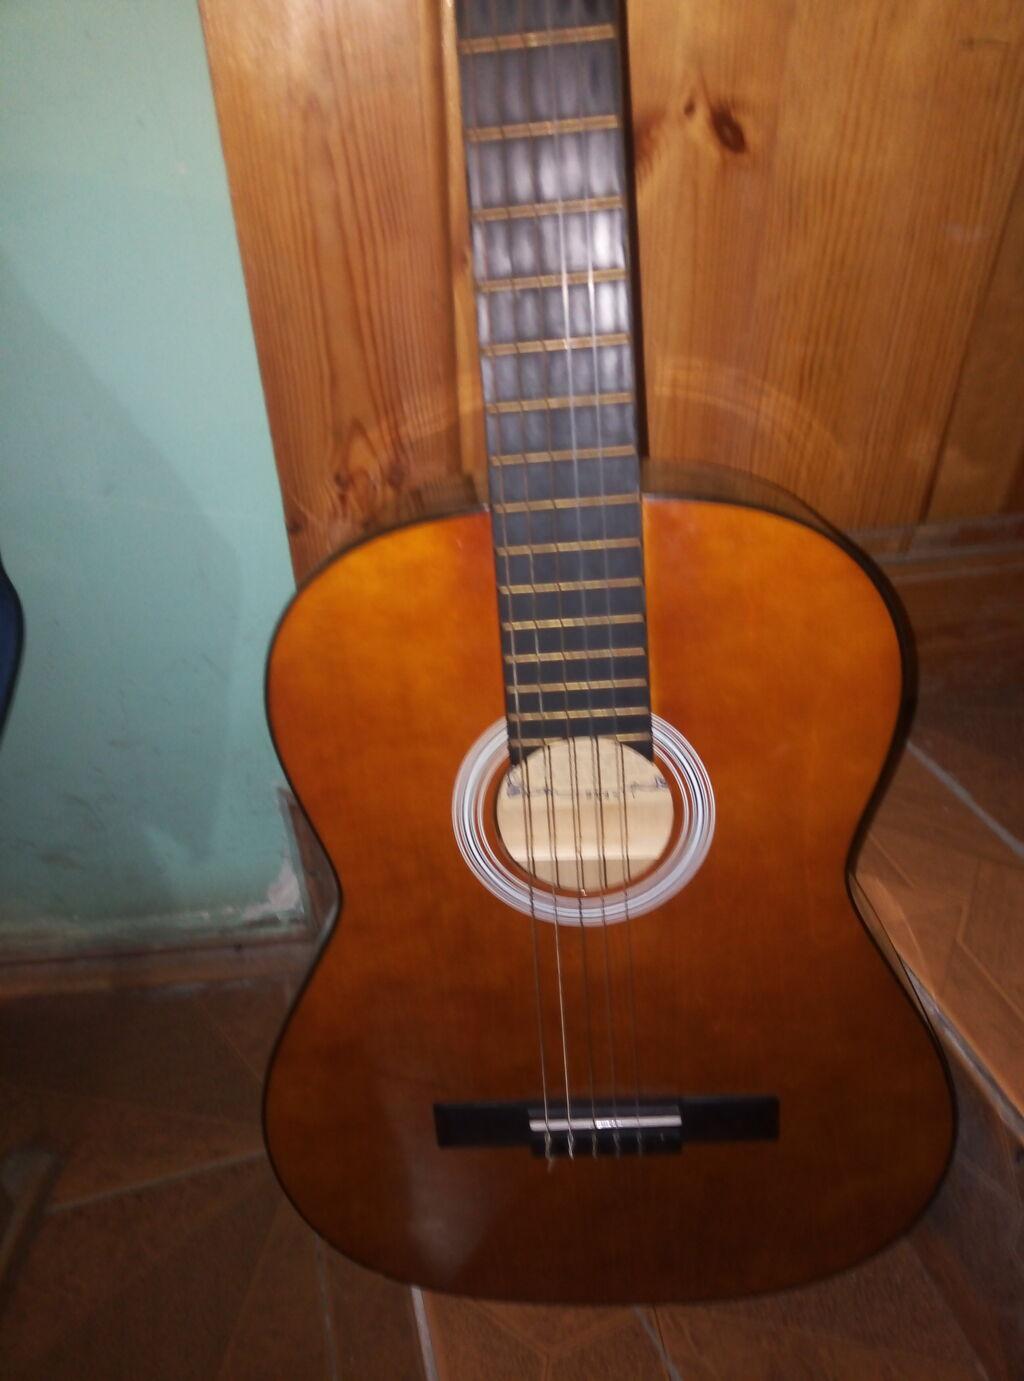 Kllasik gitara bura yazmayin zeng edin ve ya vatsapa yazin